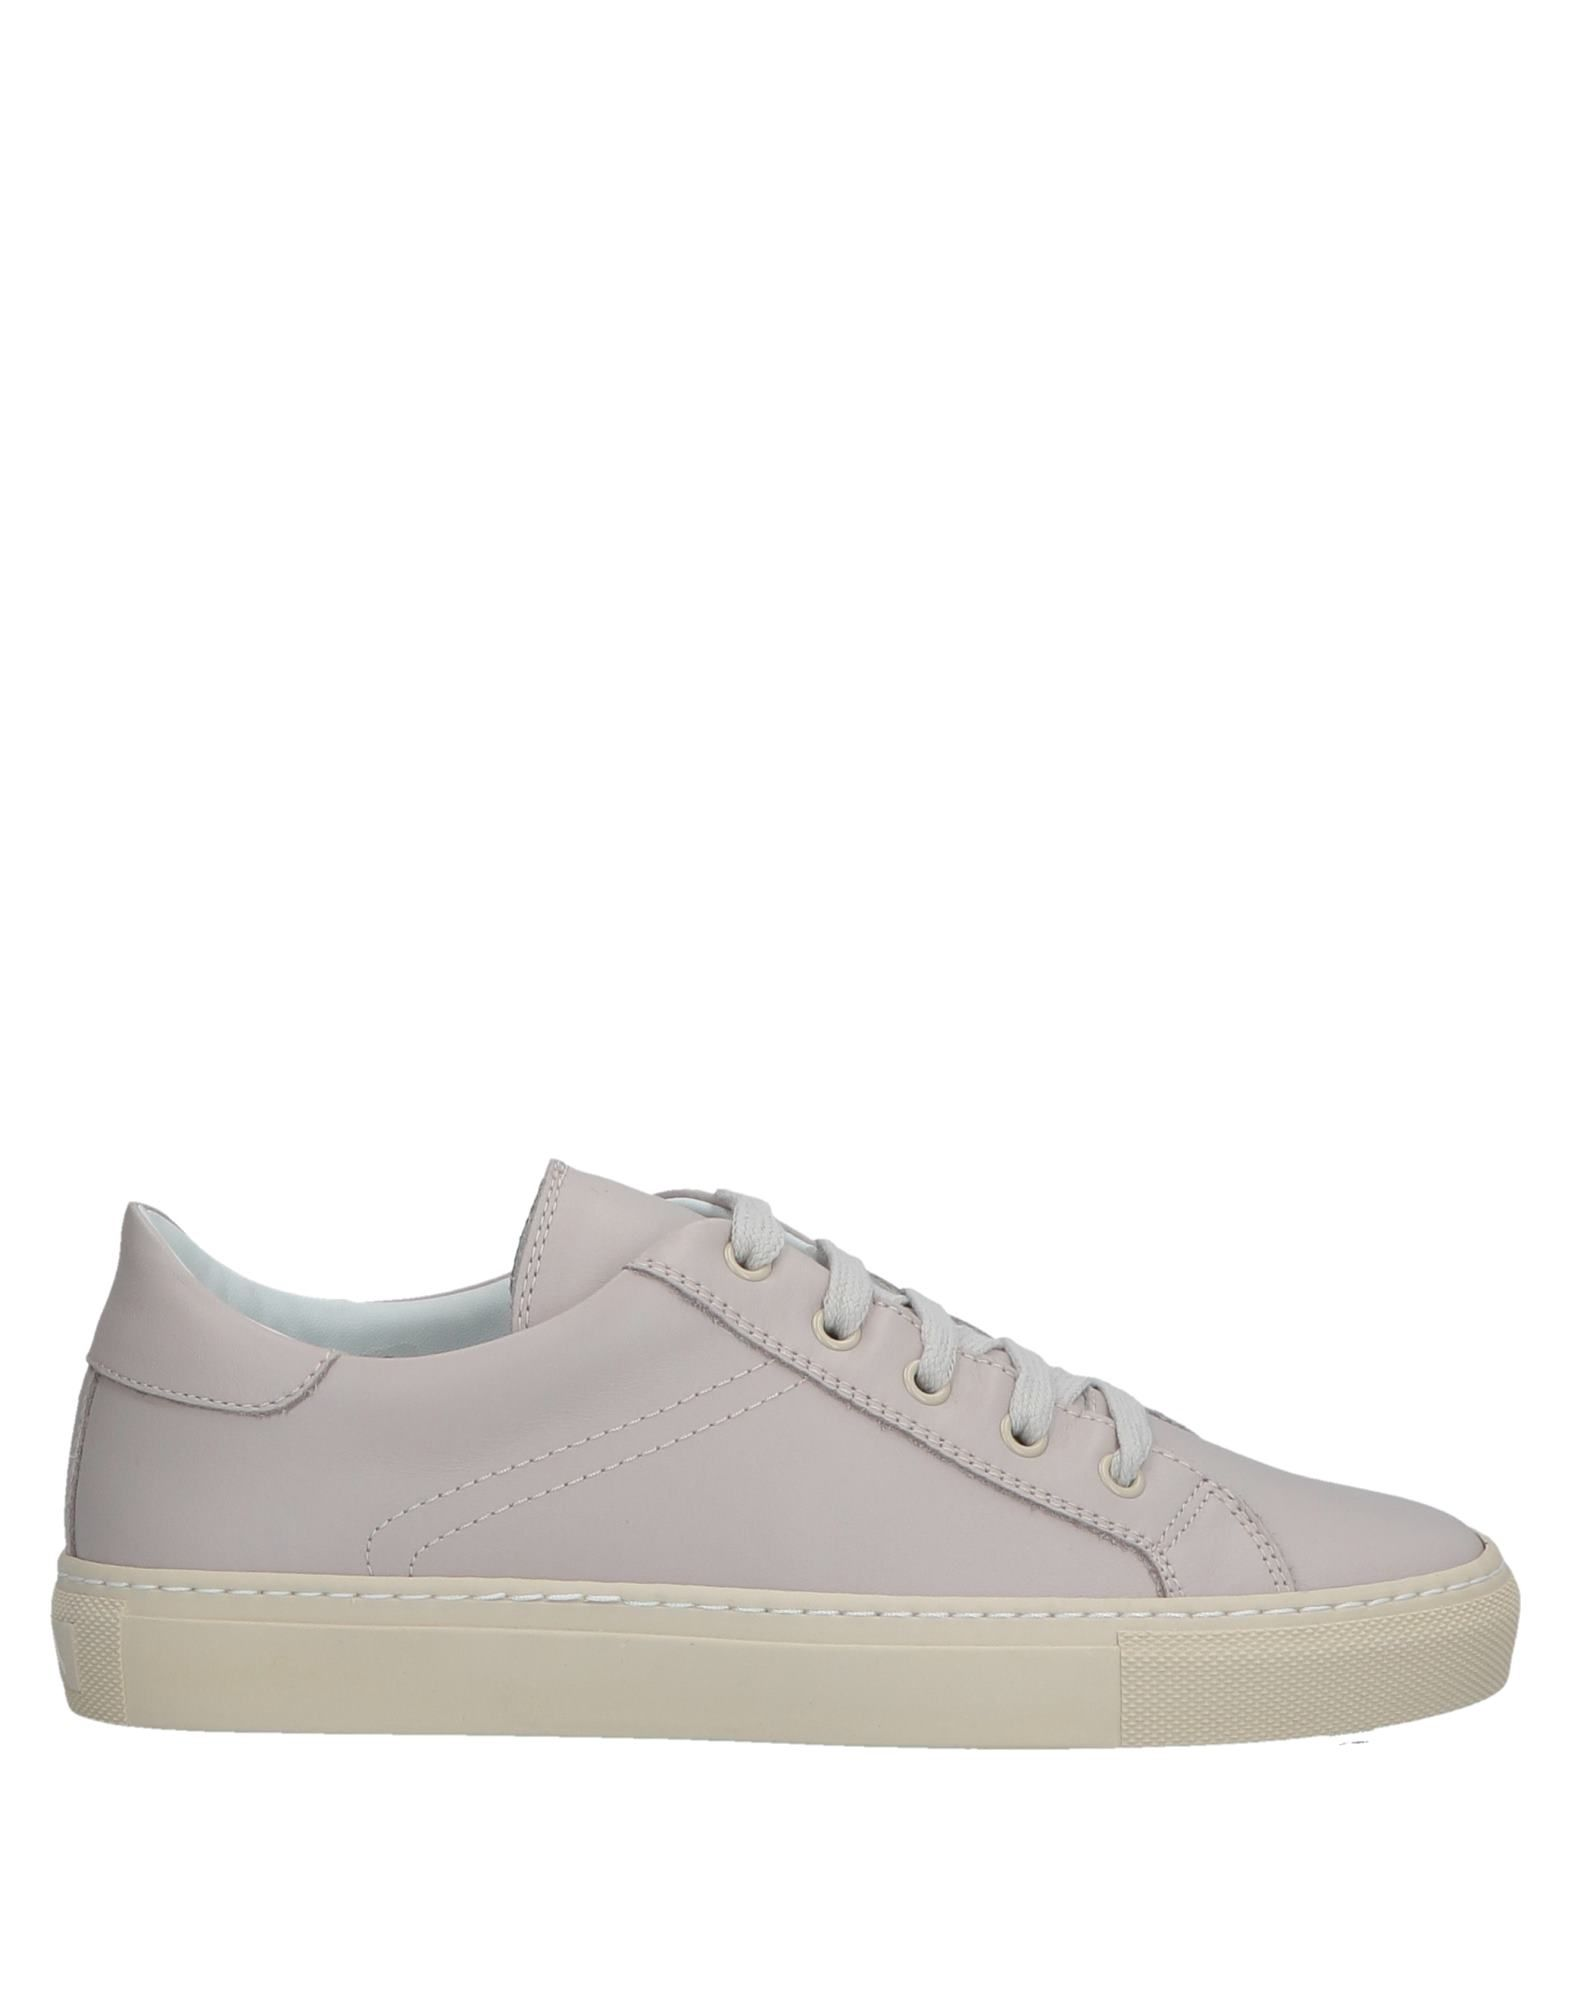 Springa Sneakers - Women Springa Sneakers online on 11572506DN  United Kingdom - 11572506DN on bc9317